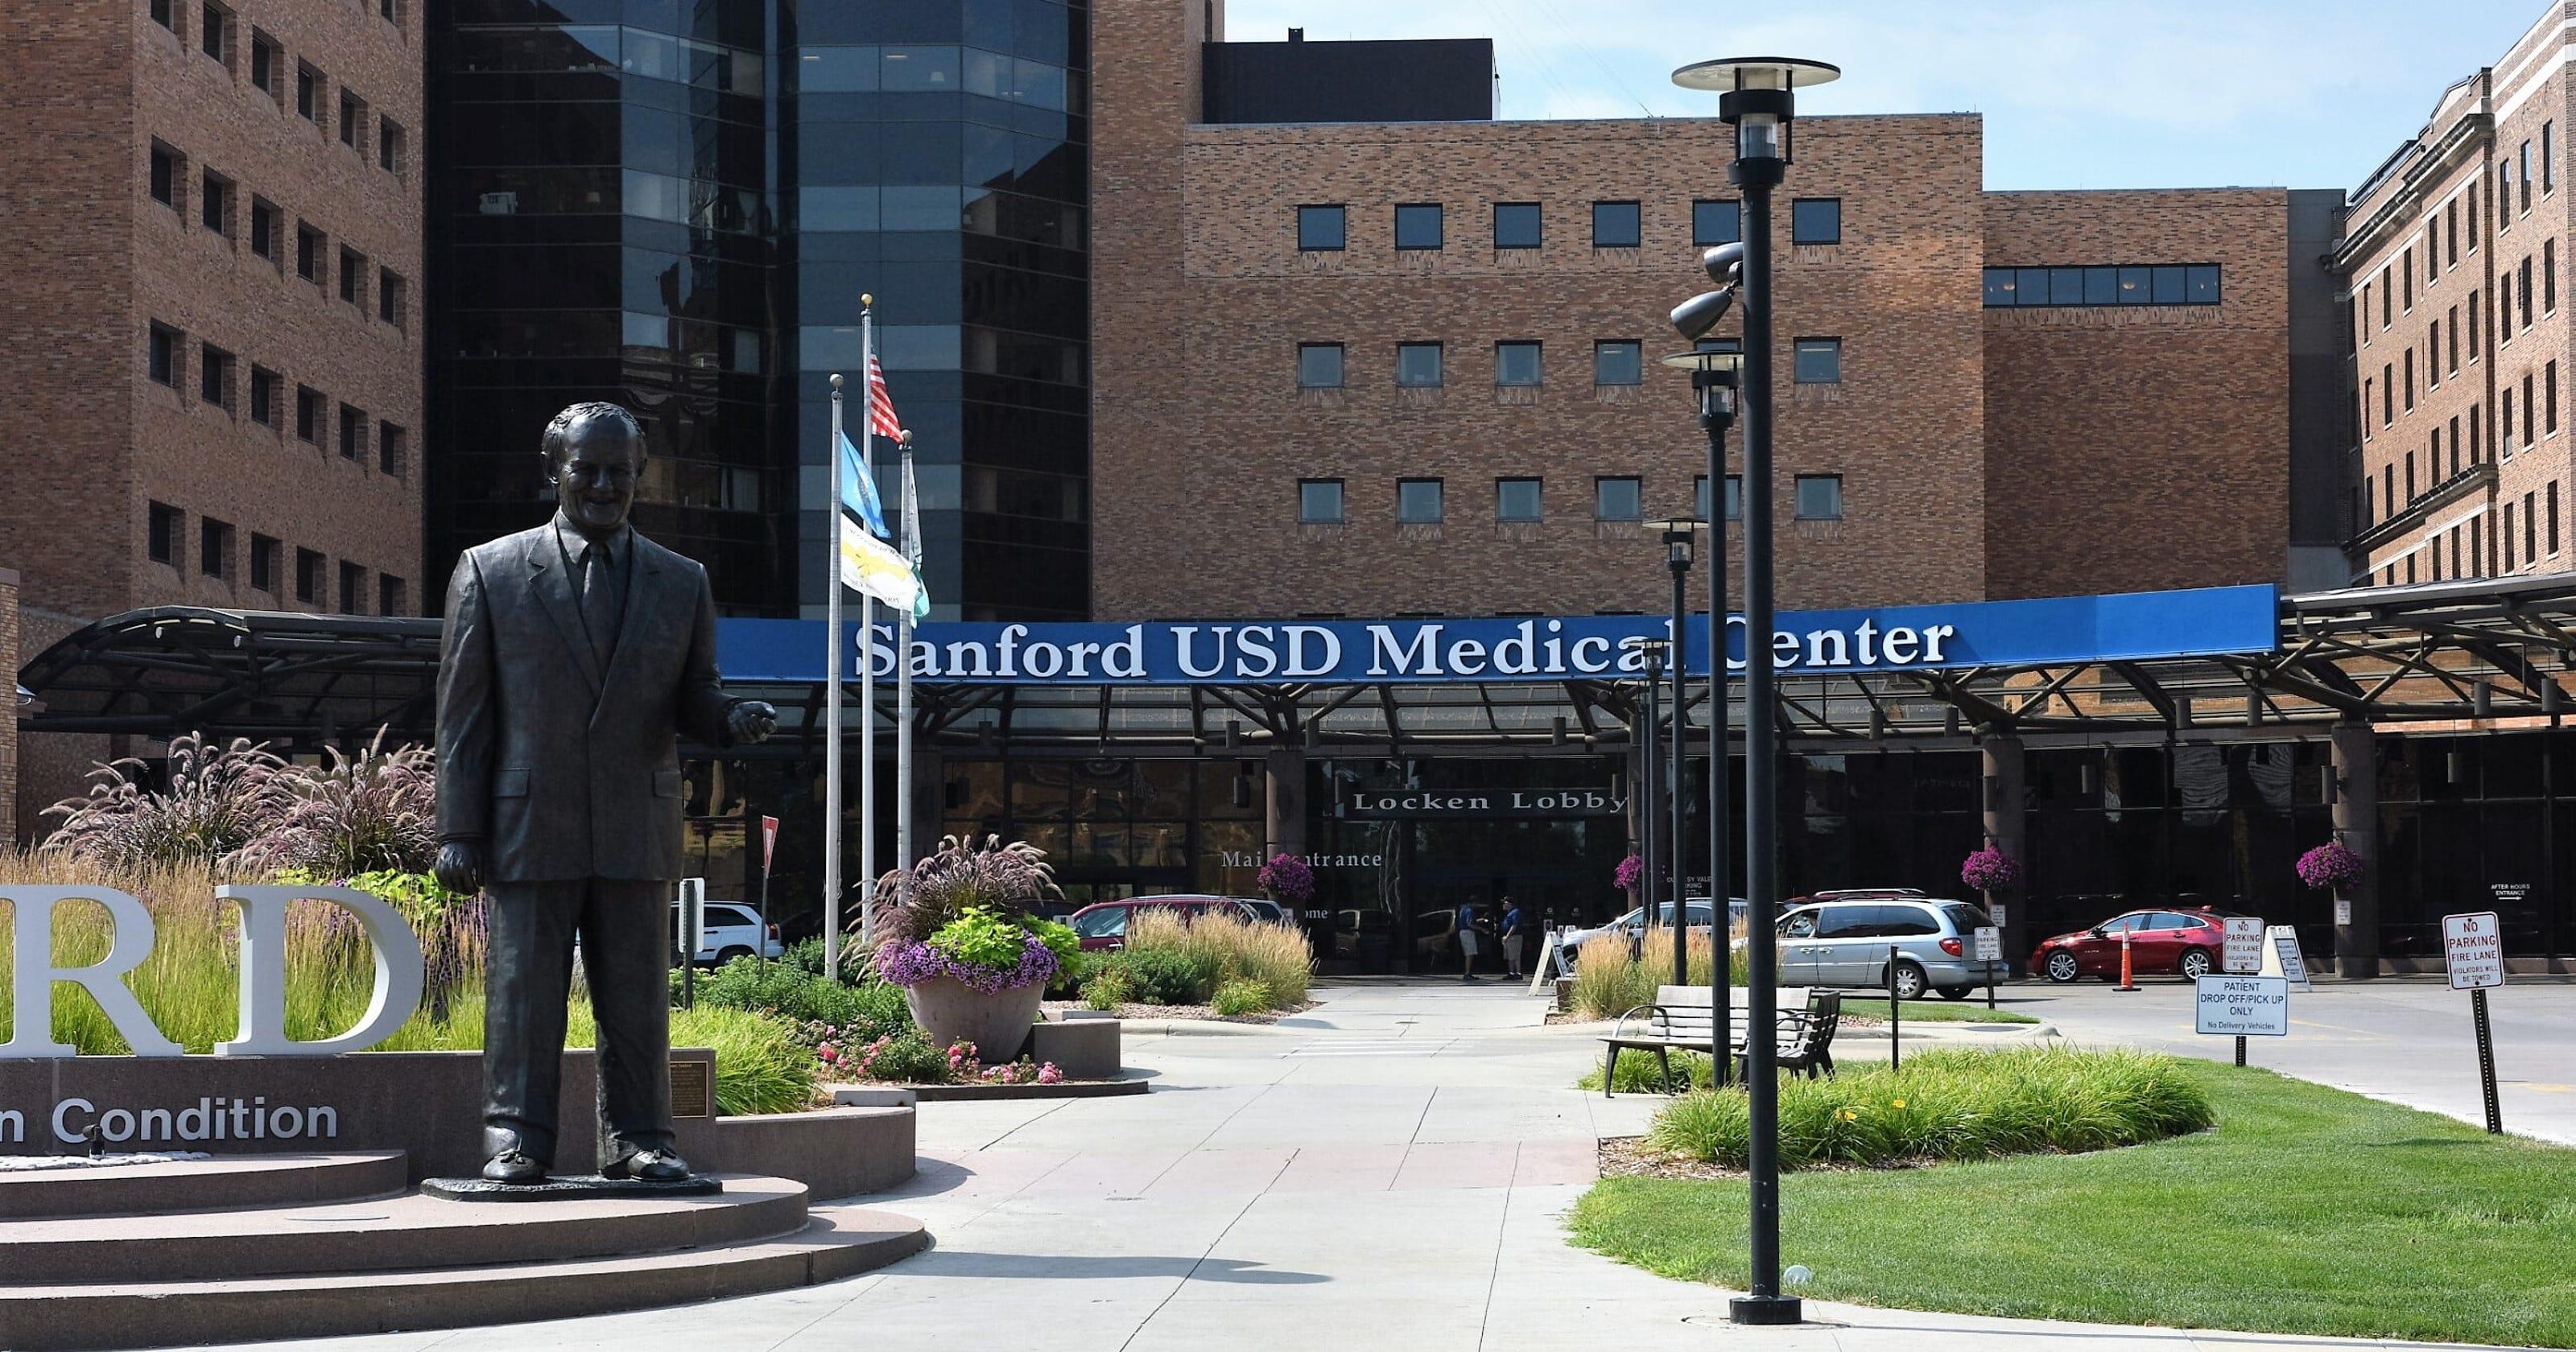 Sanford S Gift Spurred Hospital S Aggressive Expansion